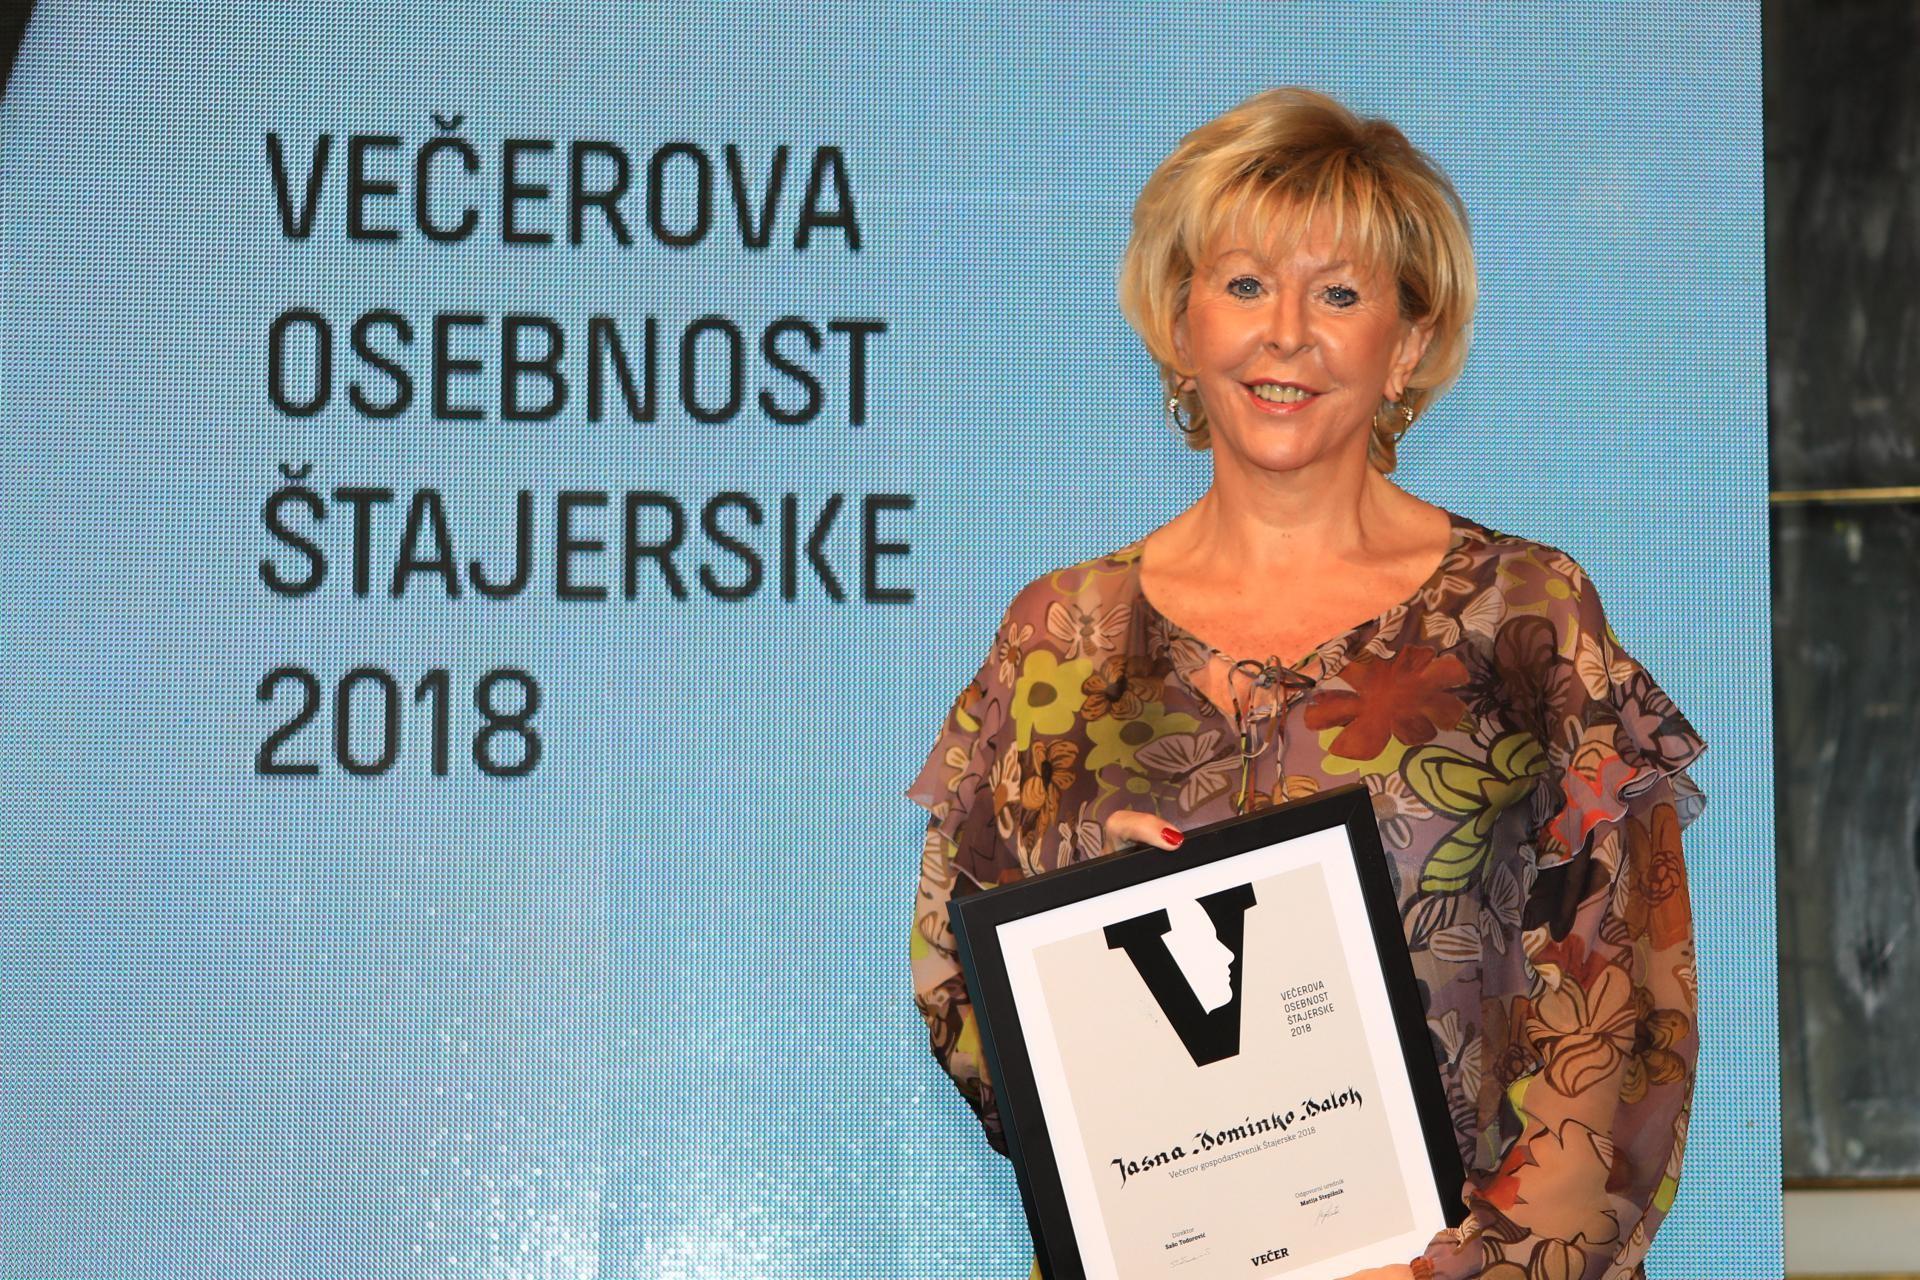 Direktorica DOBE Večerova gospodarstvenica Štajerske 2018